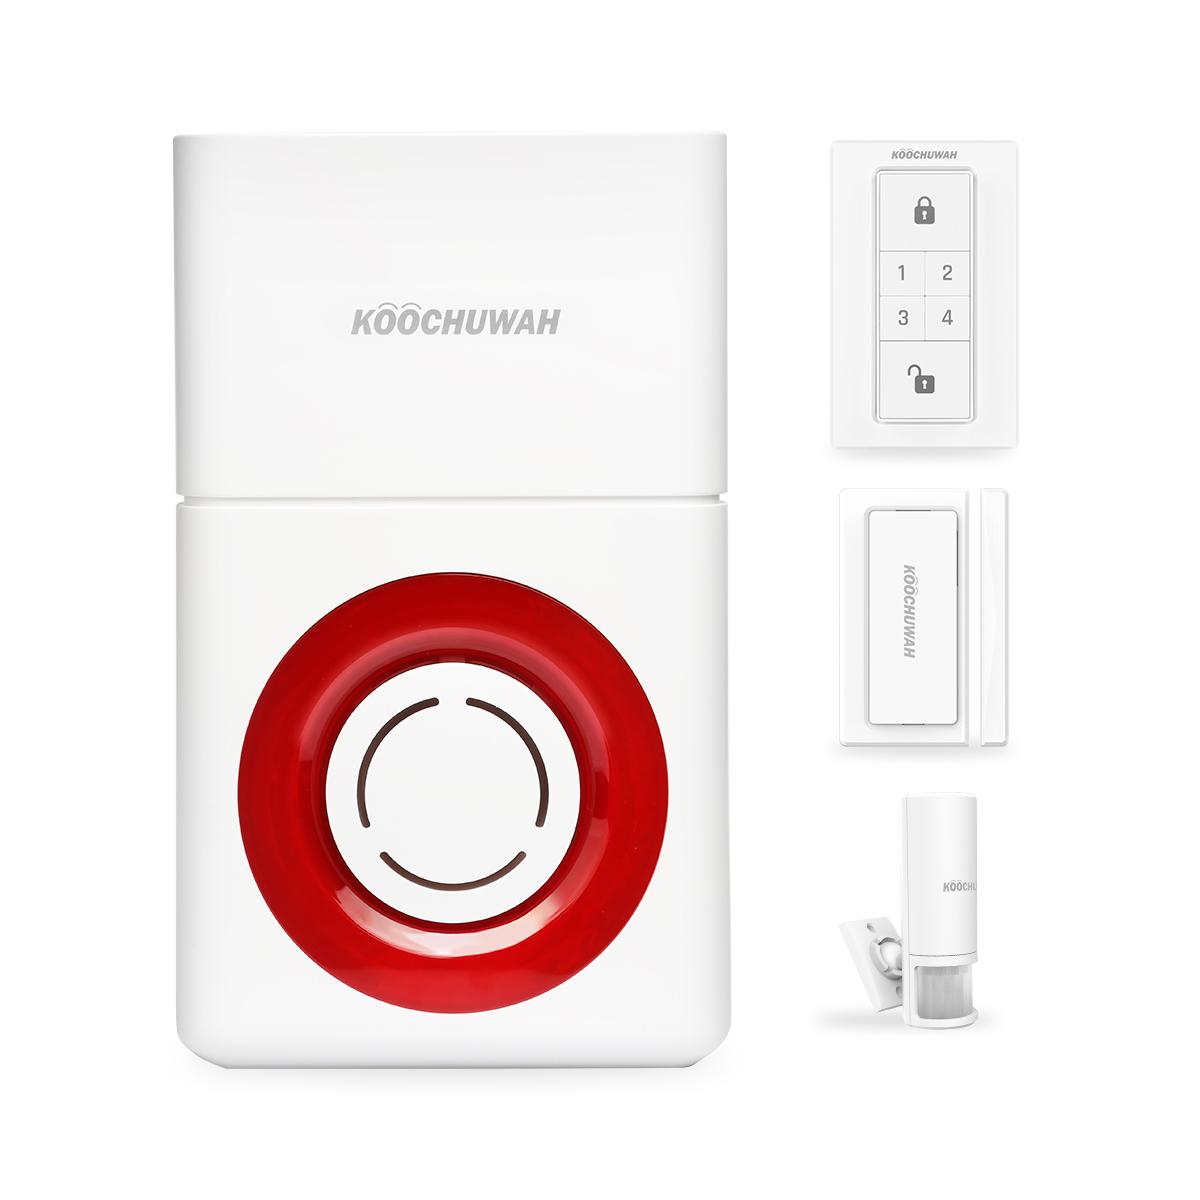 High Quality Wholesale Custom Cheap Home Burglar Alarms Systems Alarm Wireless Pir Sensor Buy Home Burglar Alarms Home Alarms Systems Home Alarm